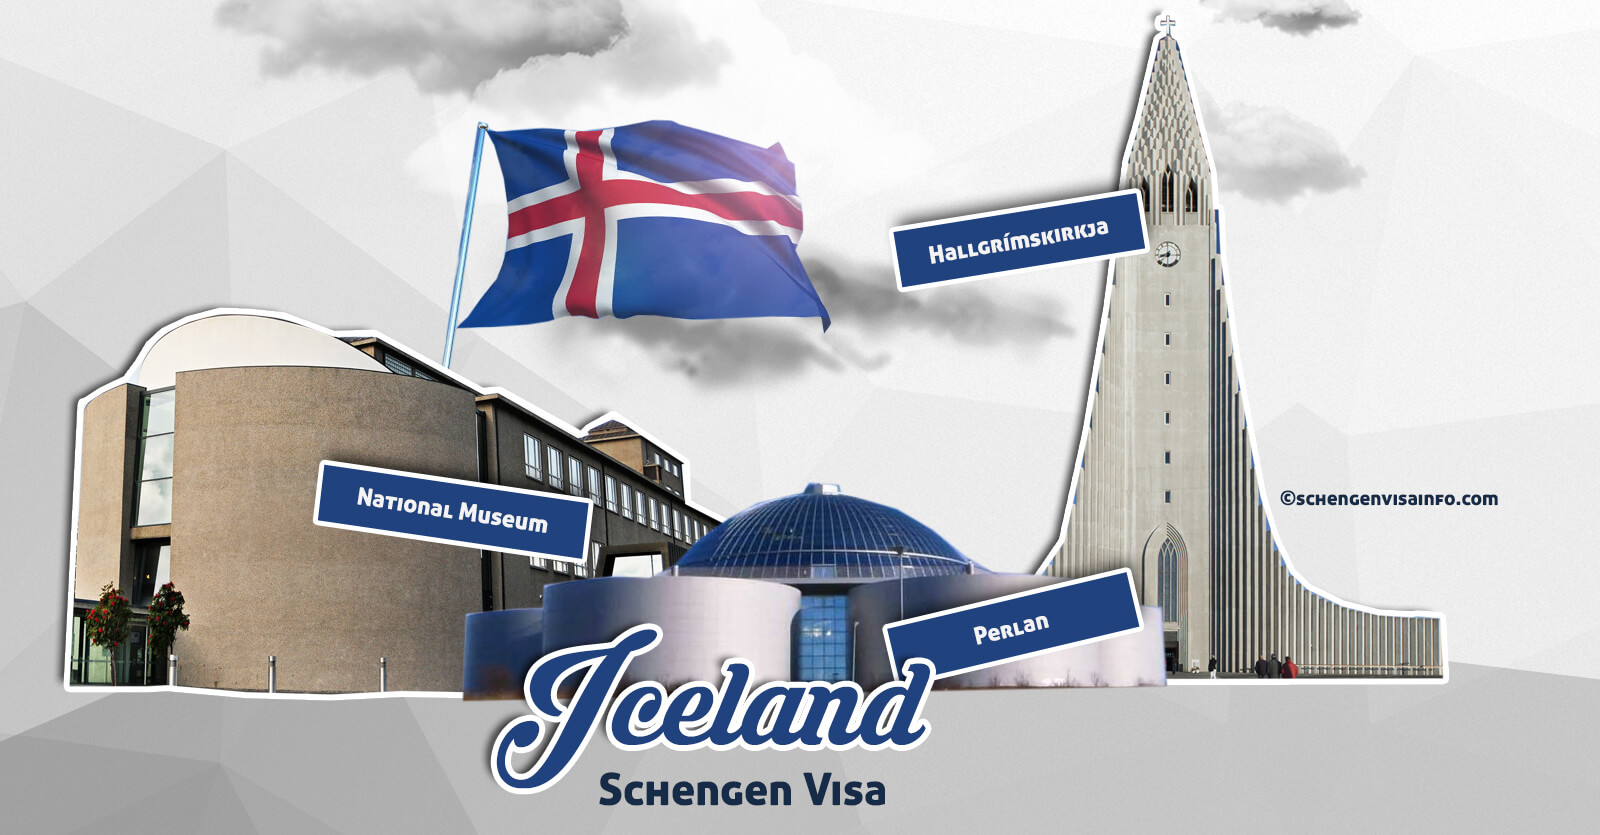 Applying for Iceland Schengen Visa in the UK - Iceland VISA